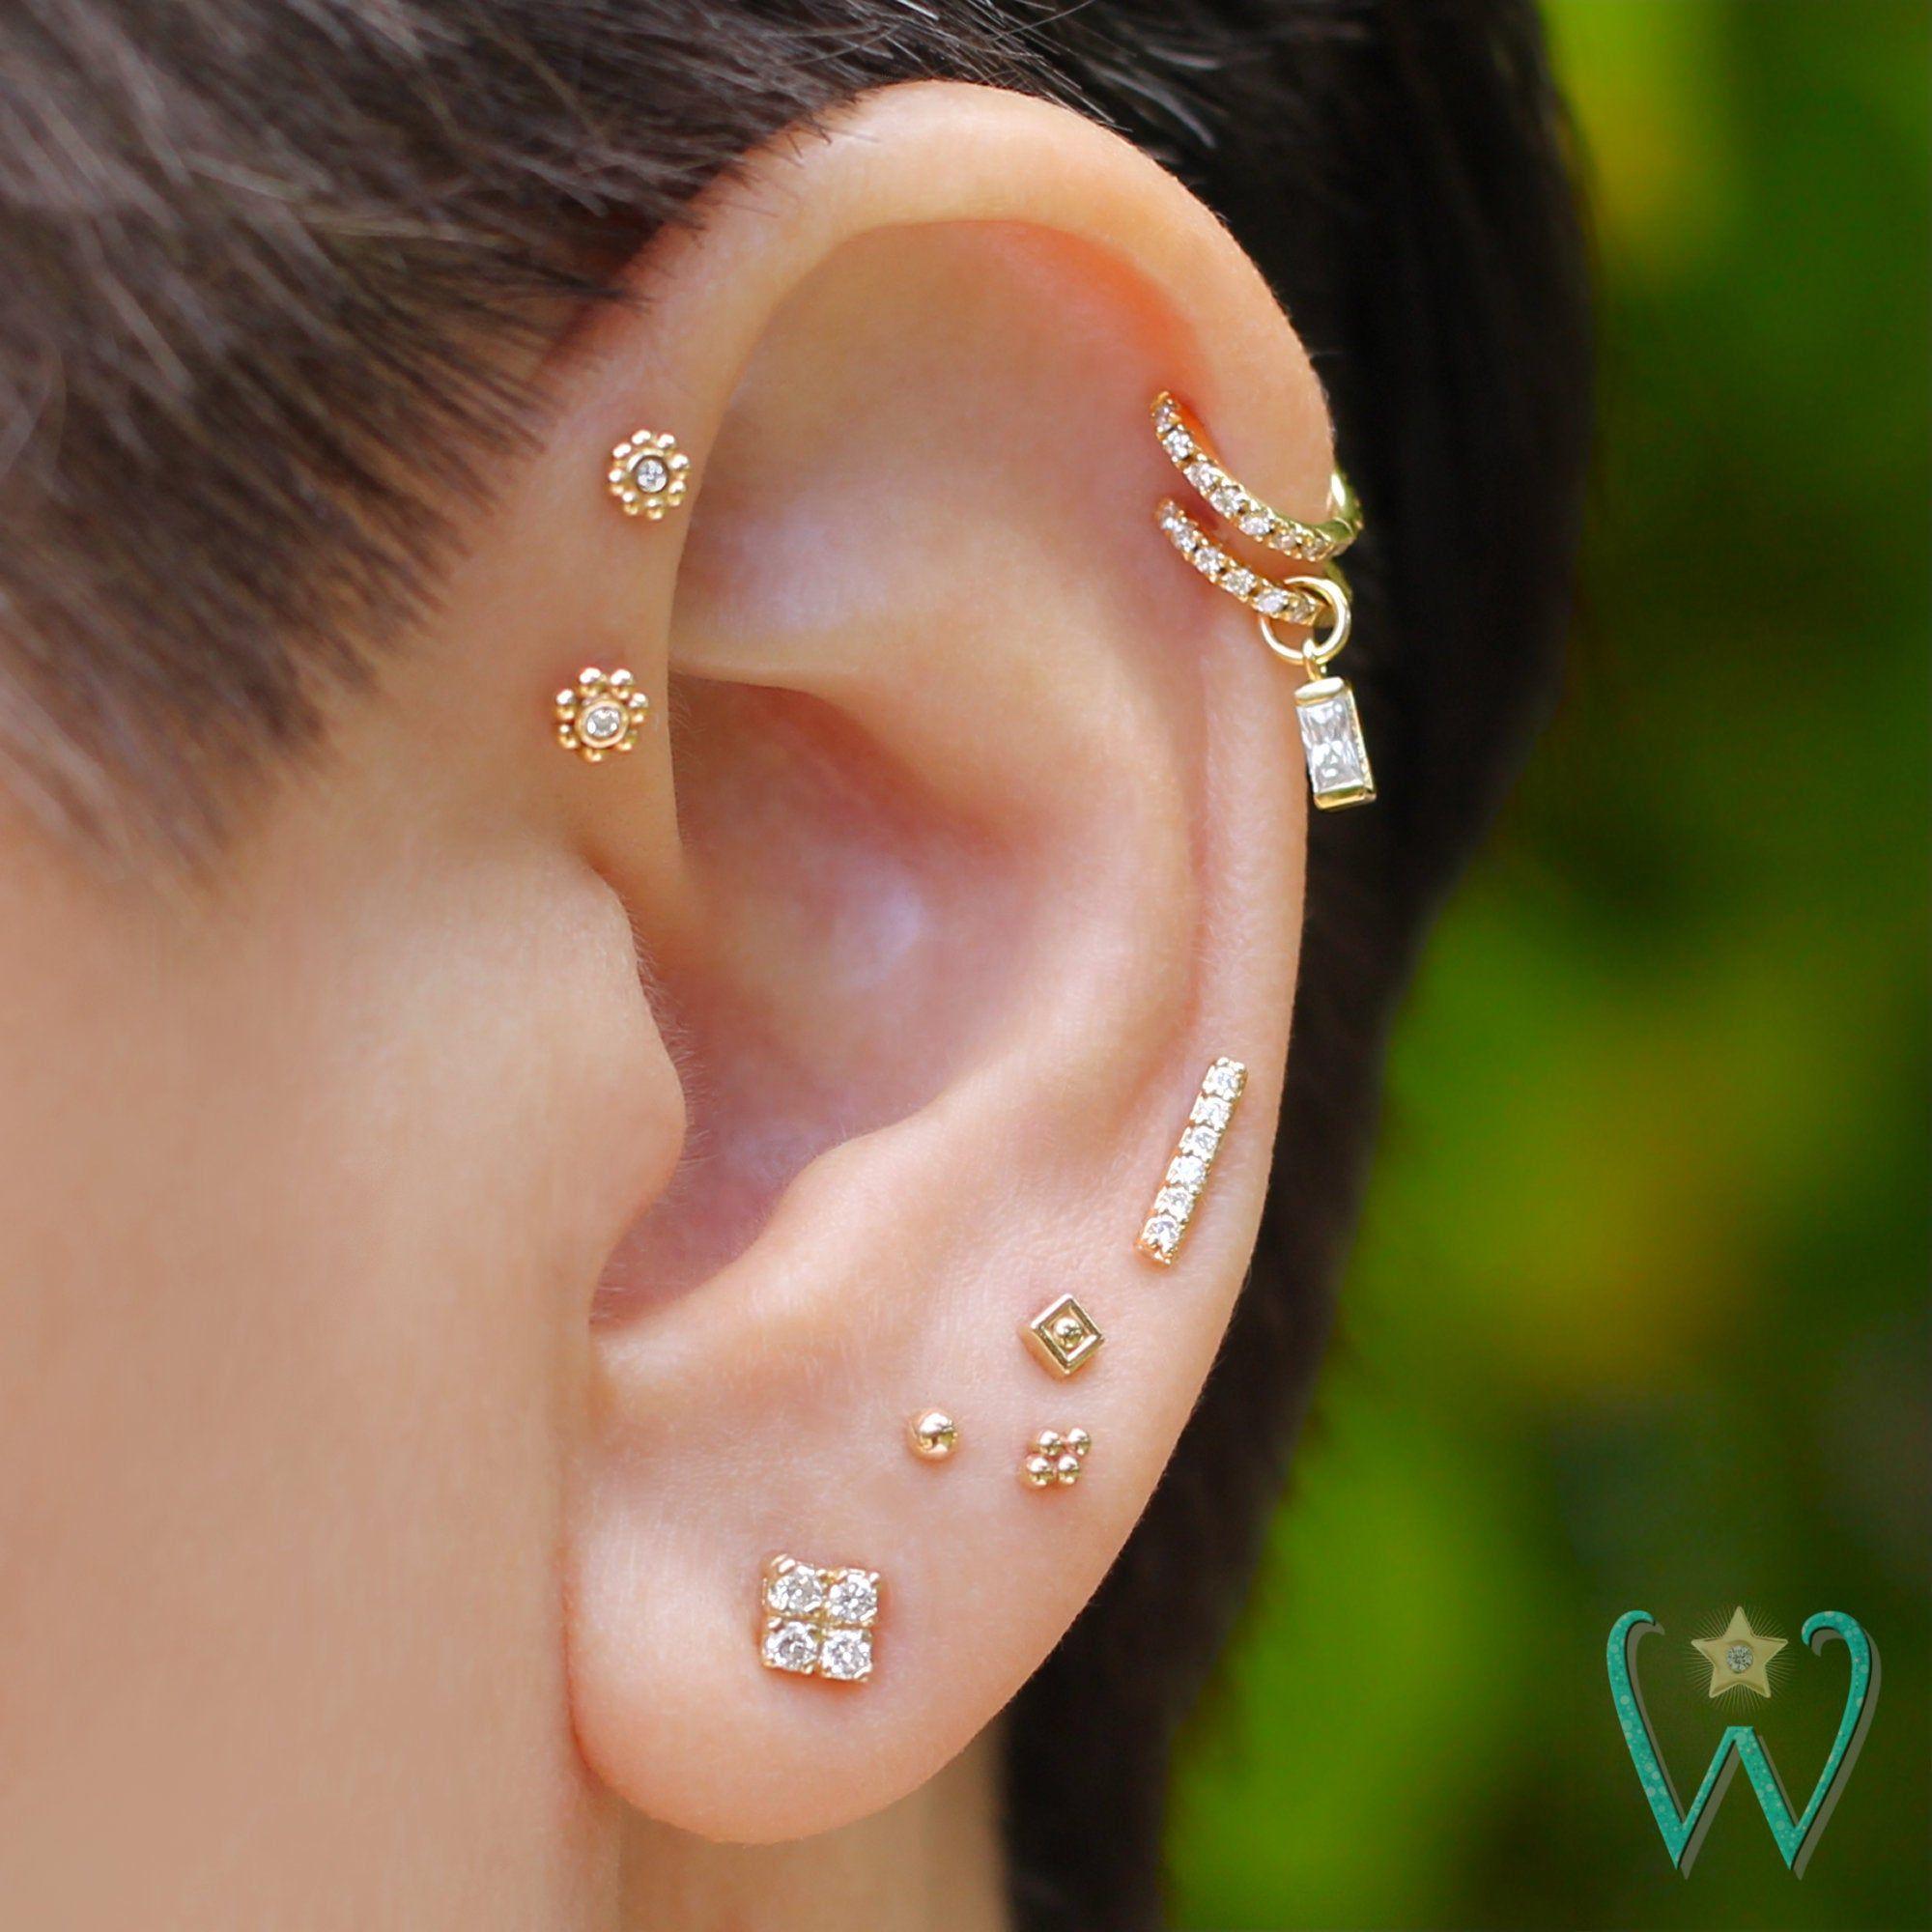 Lab Diamond Baguette Earring Charm Cartilage Earring | Etsy